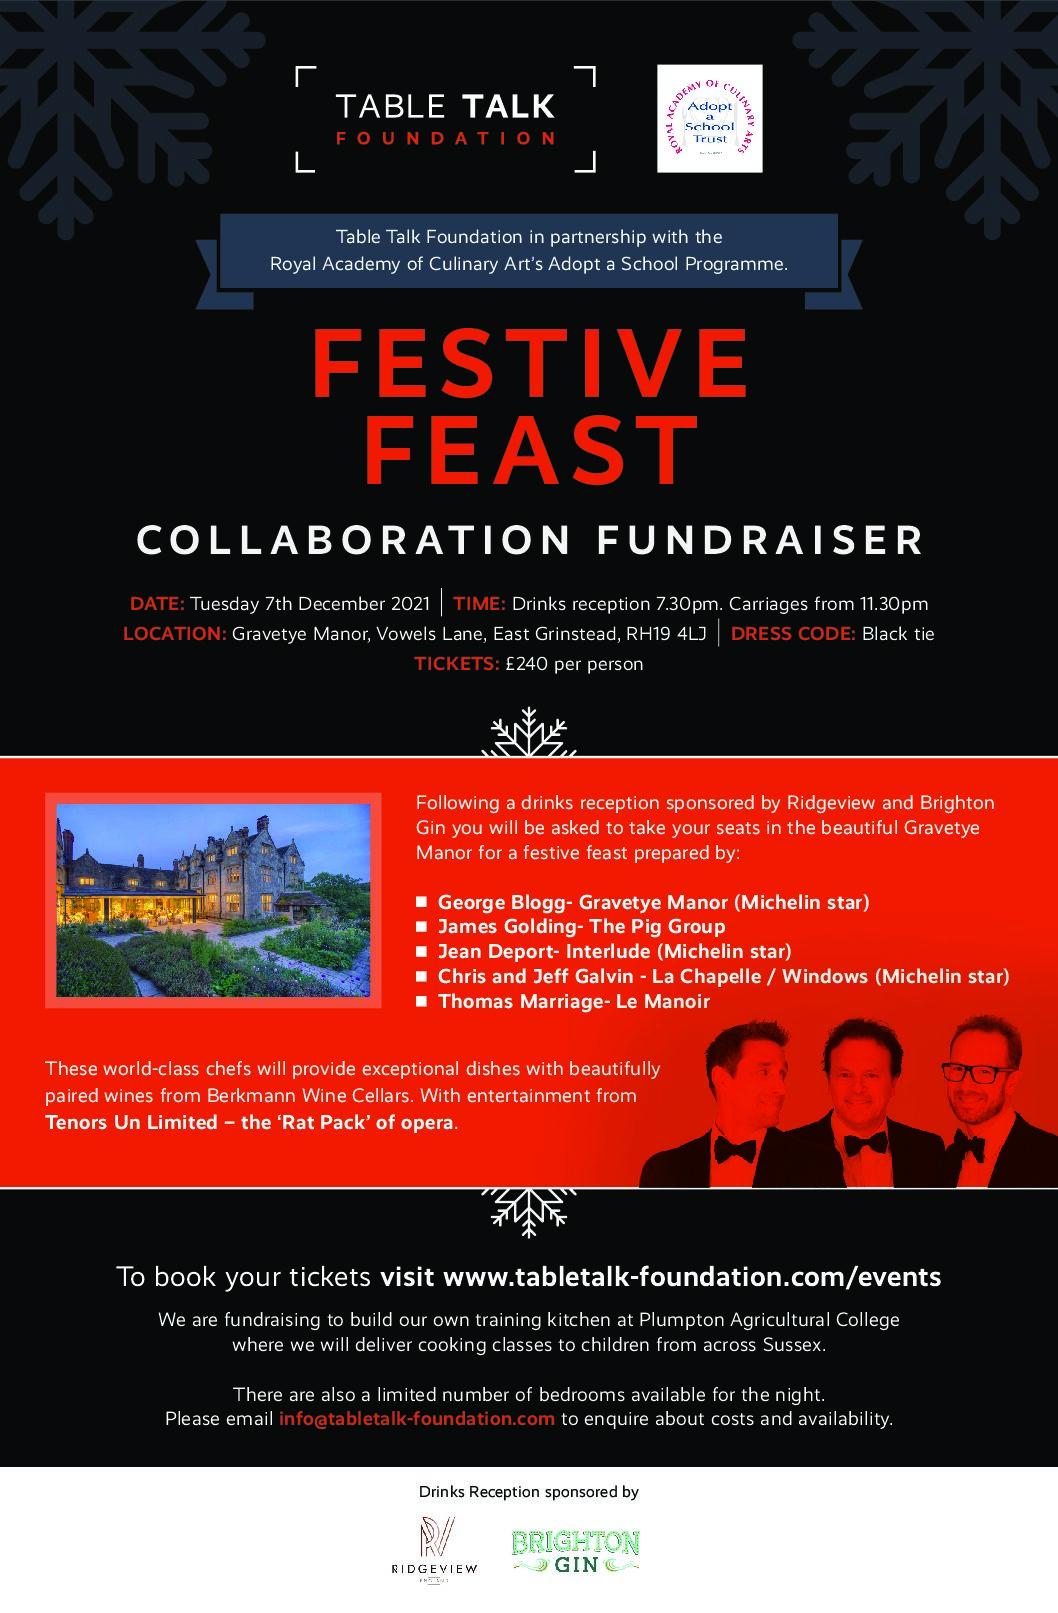 Table Talk Festive Fundraiser